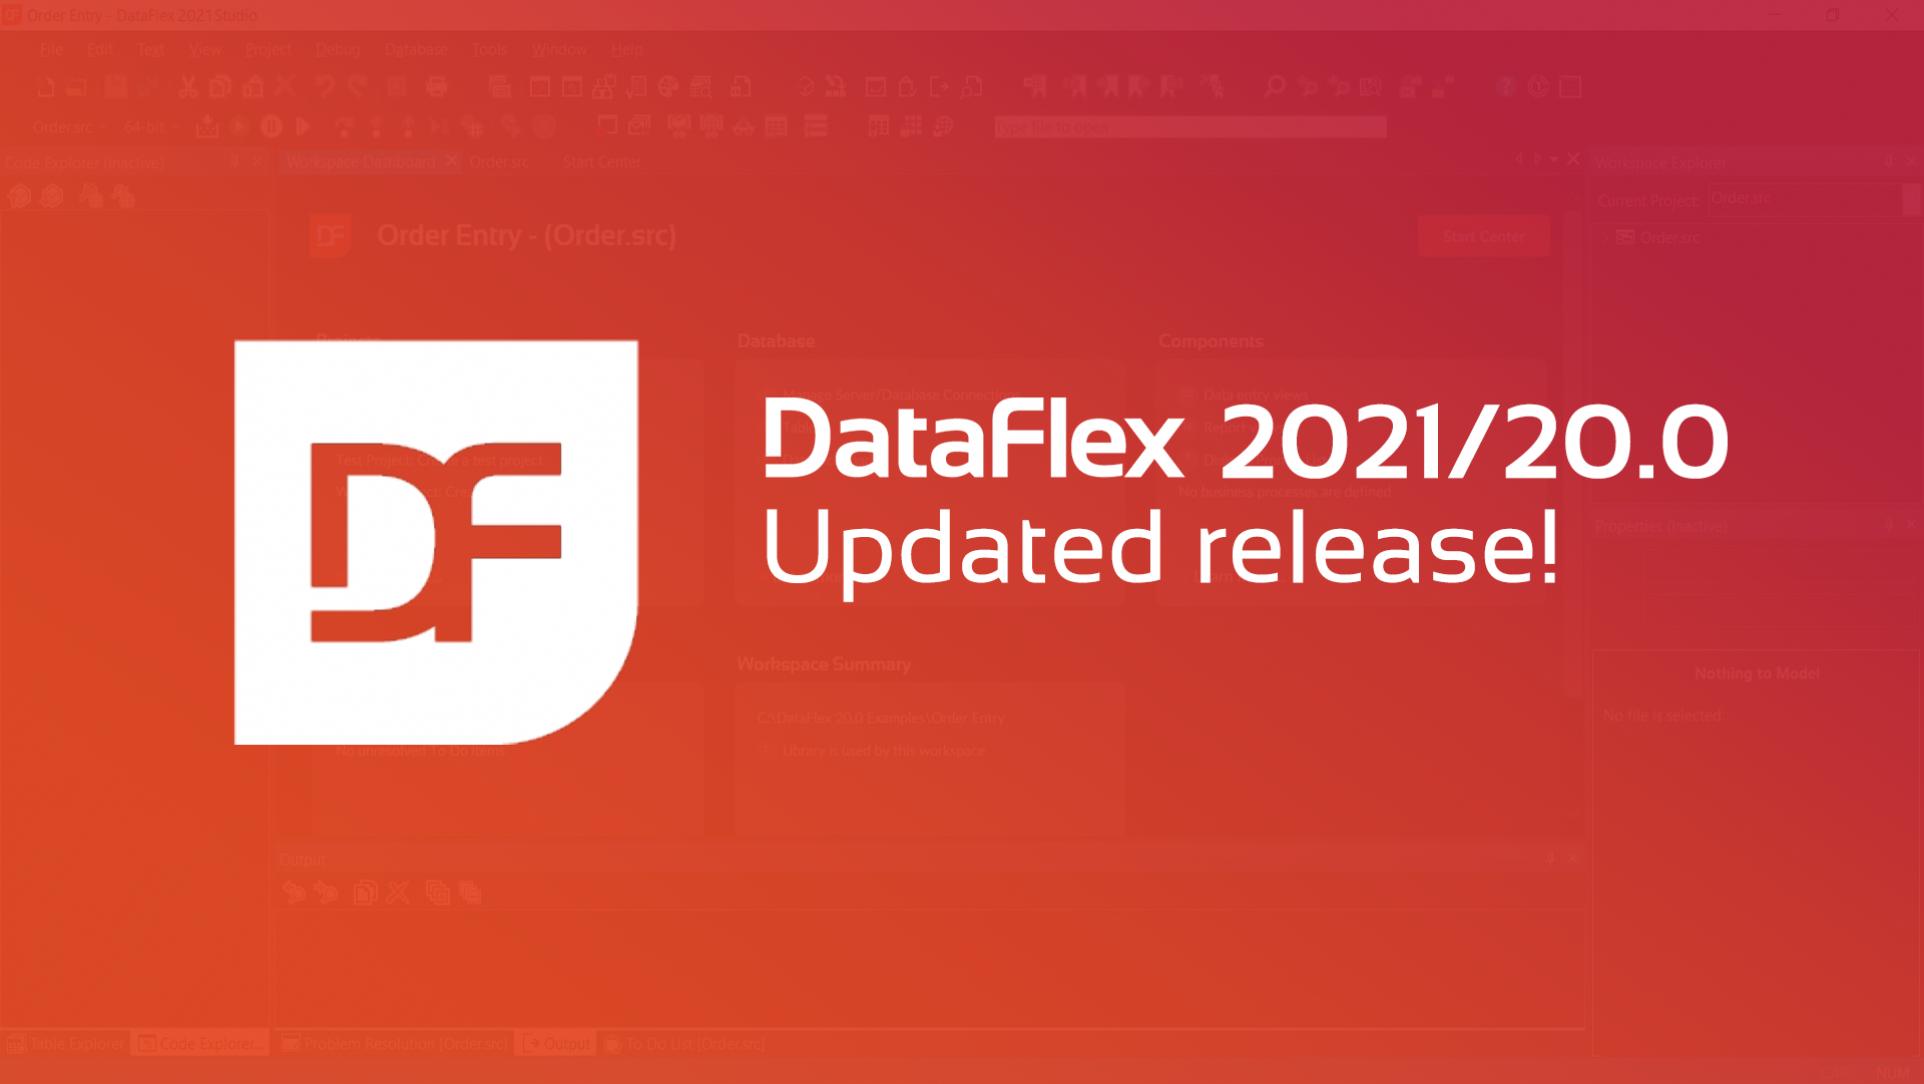 2021-04-19 DataFlex 2021 Update release